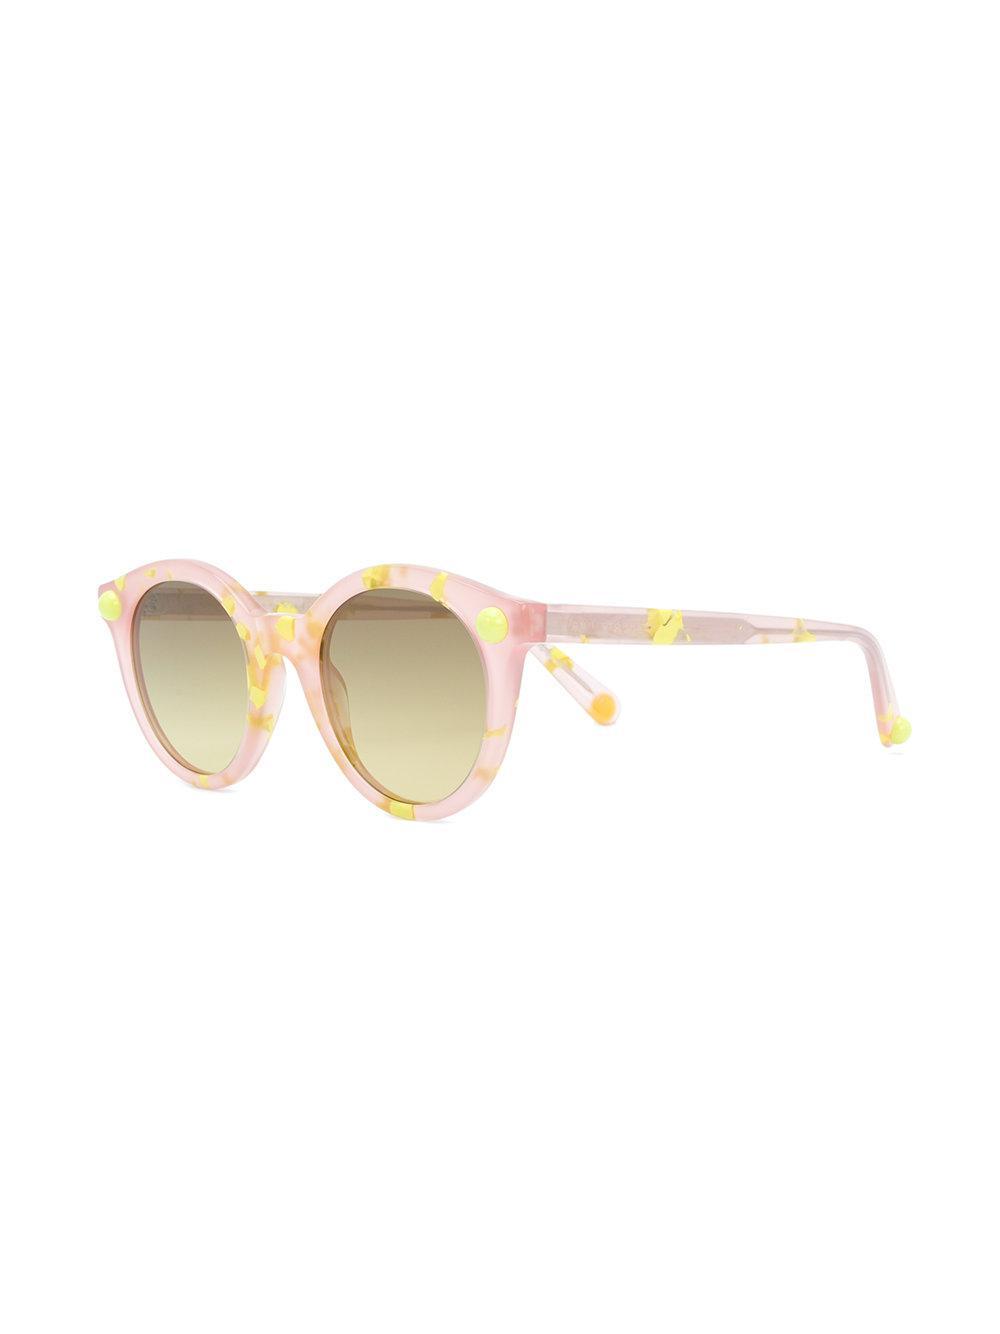 square frame speckled sunglasses - Yellow & Orange Christopher Kane Eyewear y6cHh38zP1